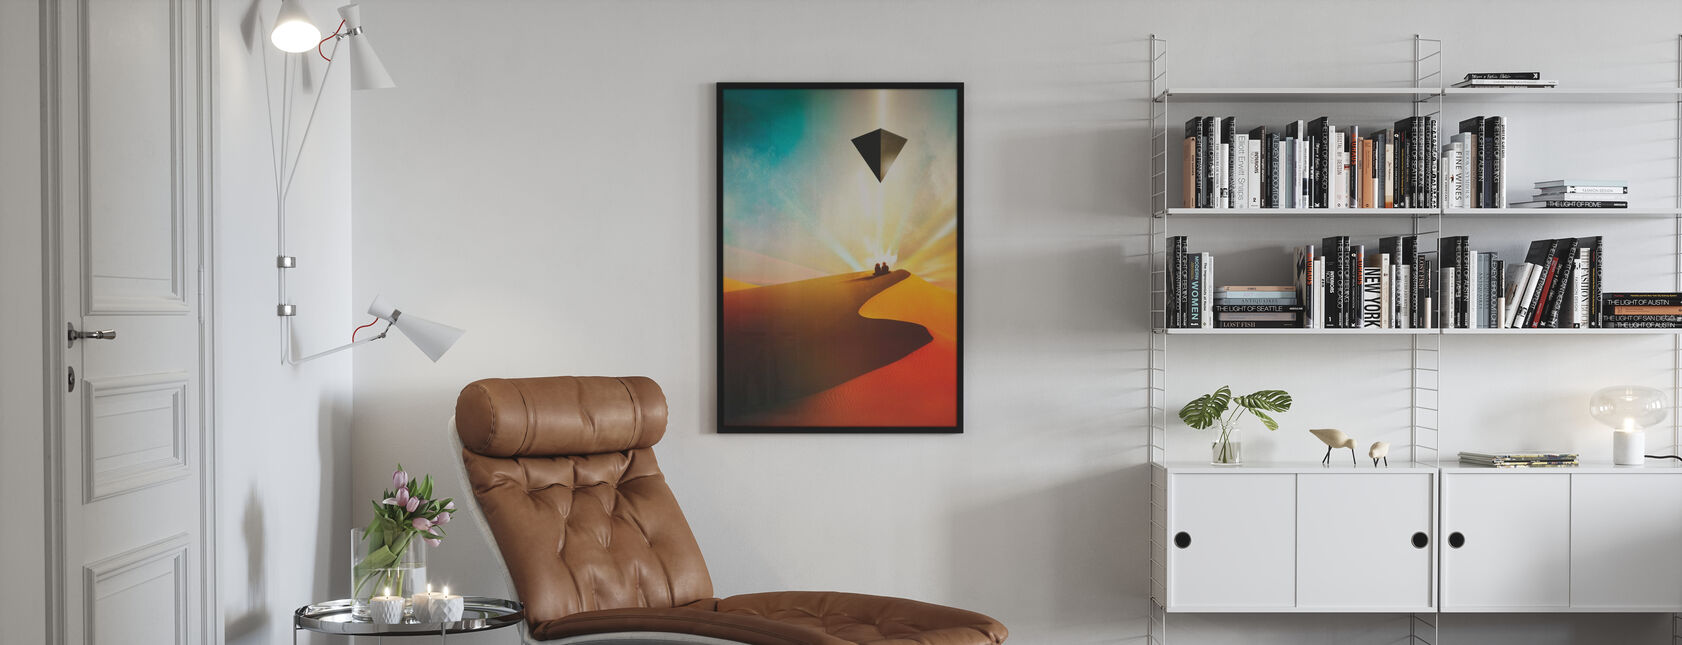 Dune - Inramad tavla - Vardagsrum